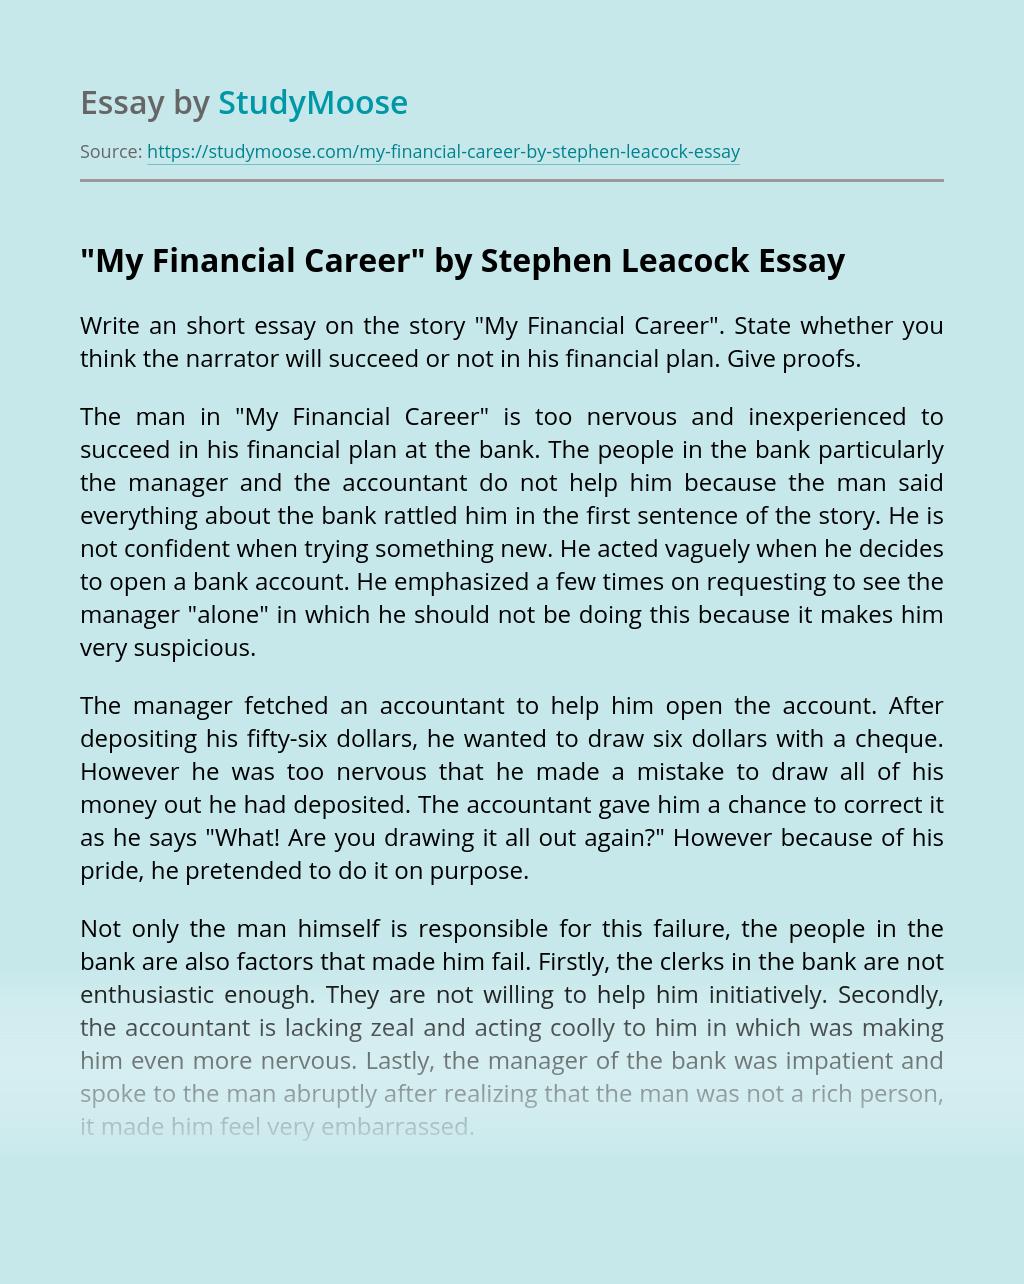 """My Financial Career"" by Stephen Leacock"